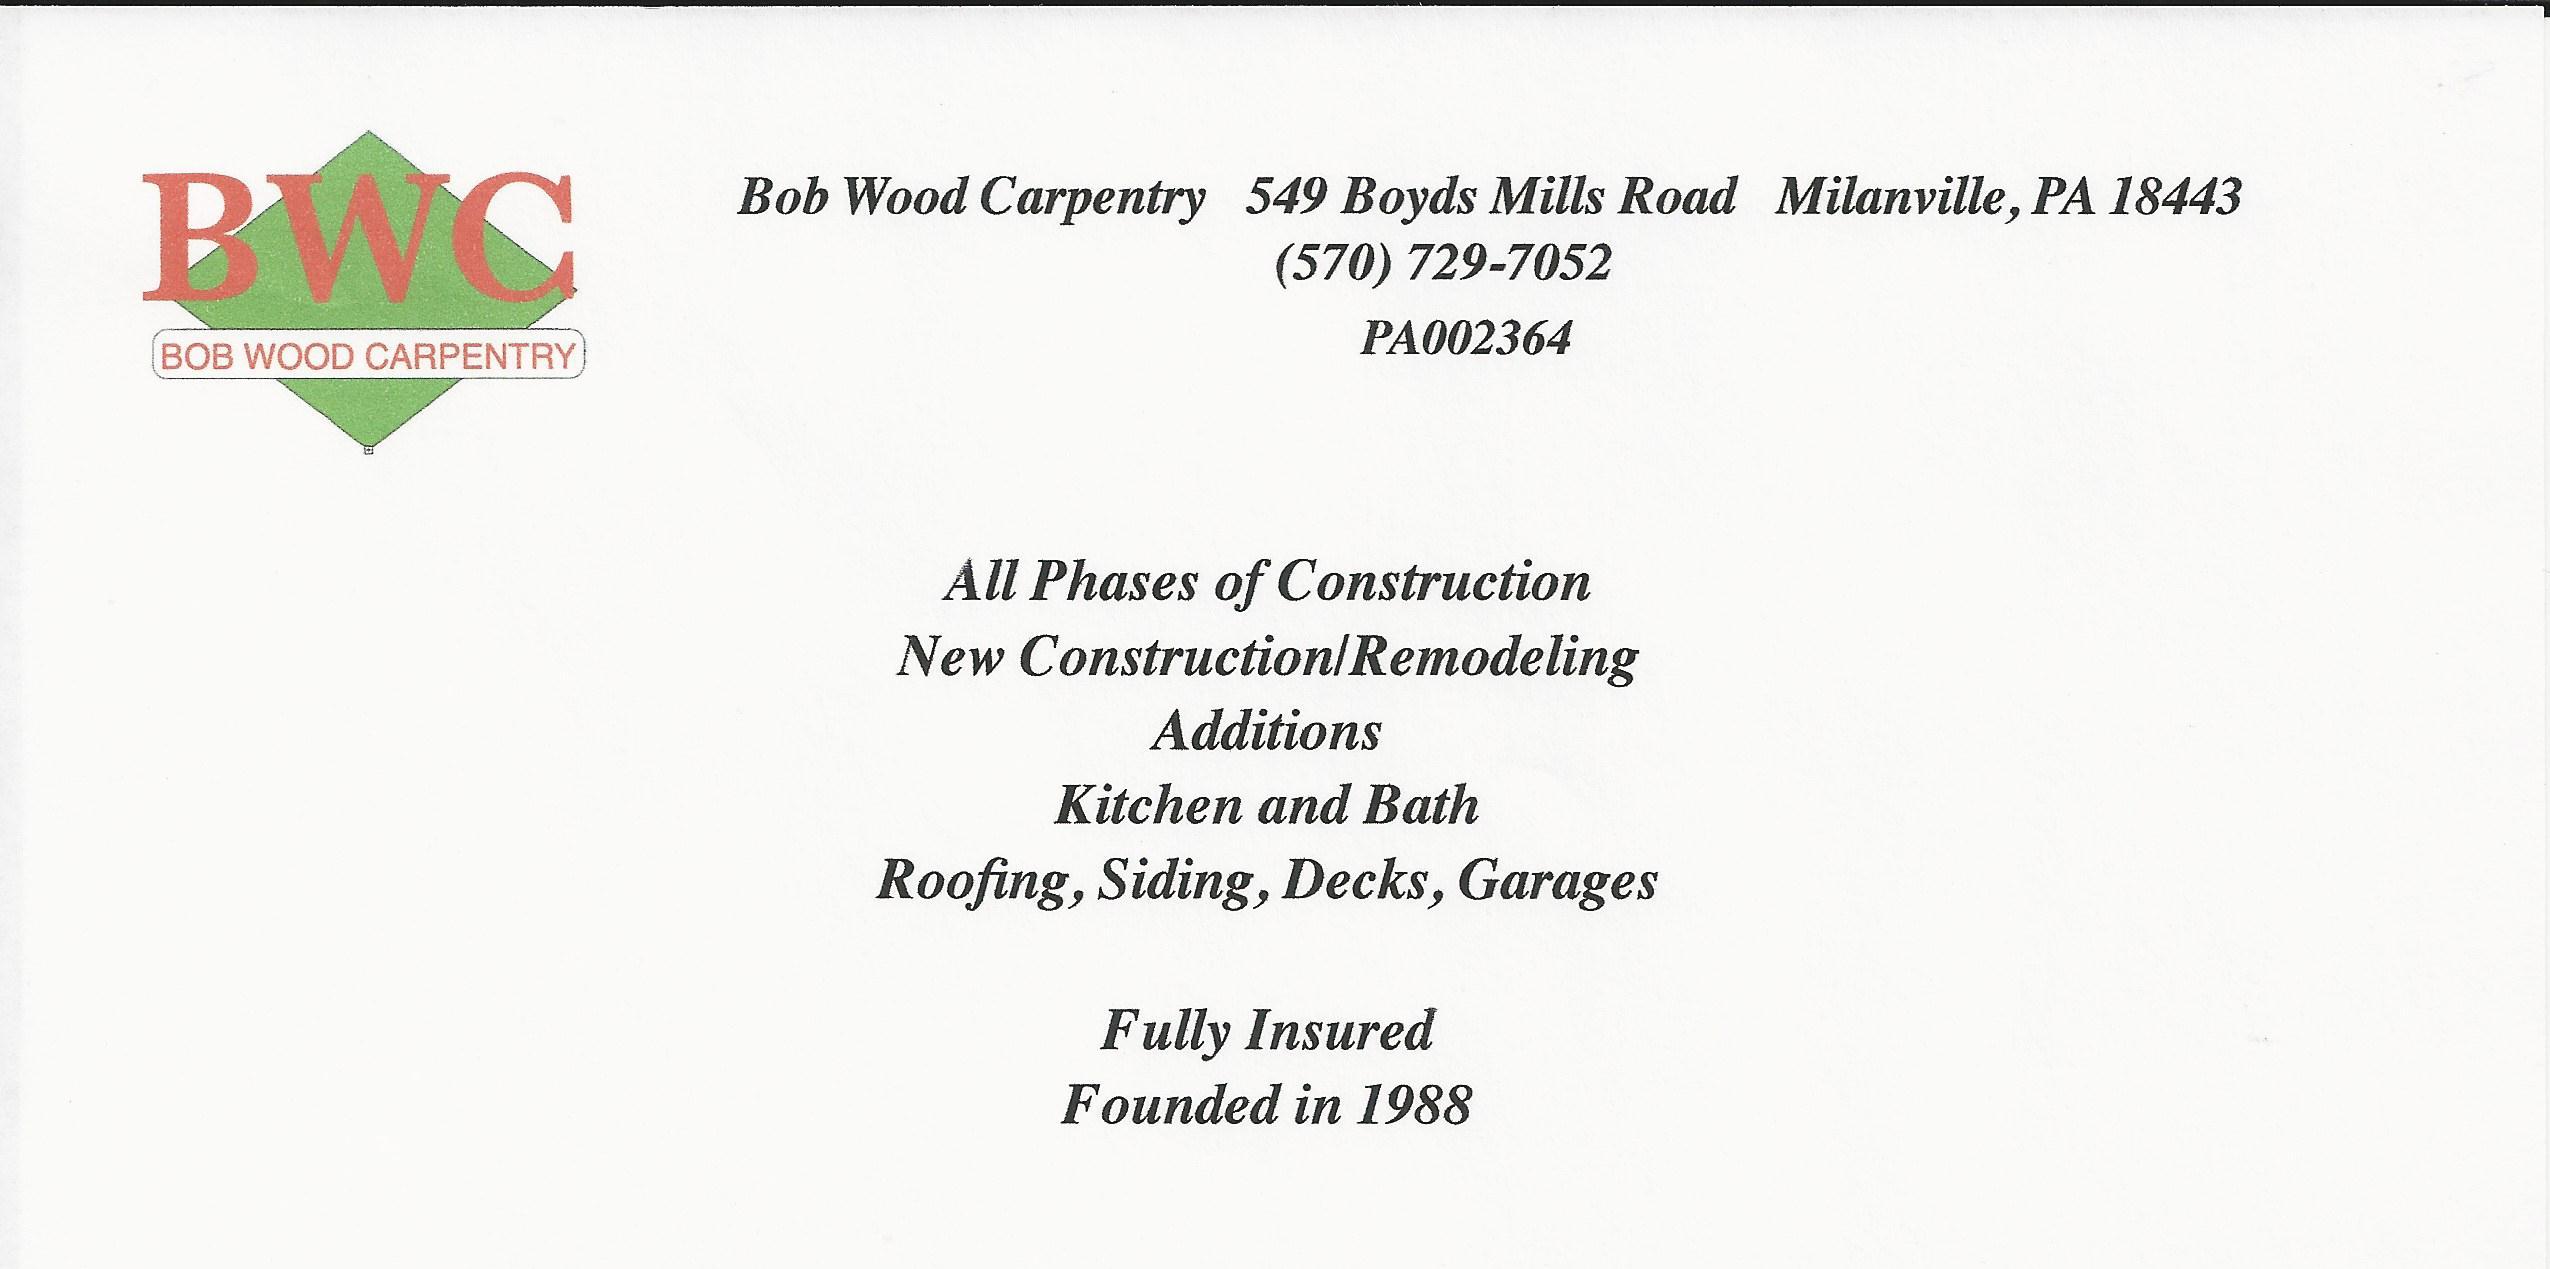 Bob Wood Carpentry